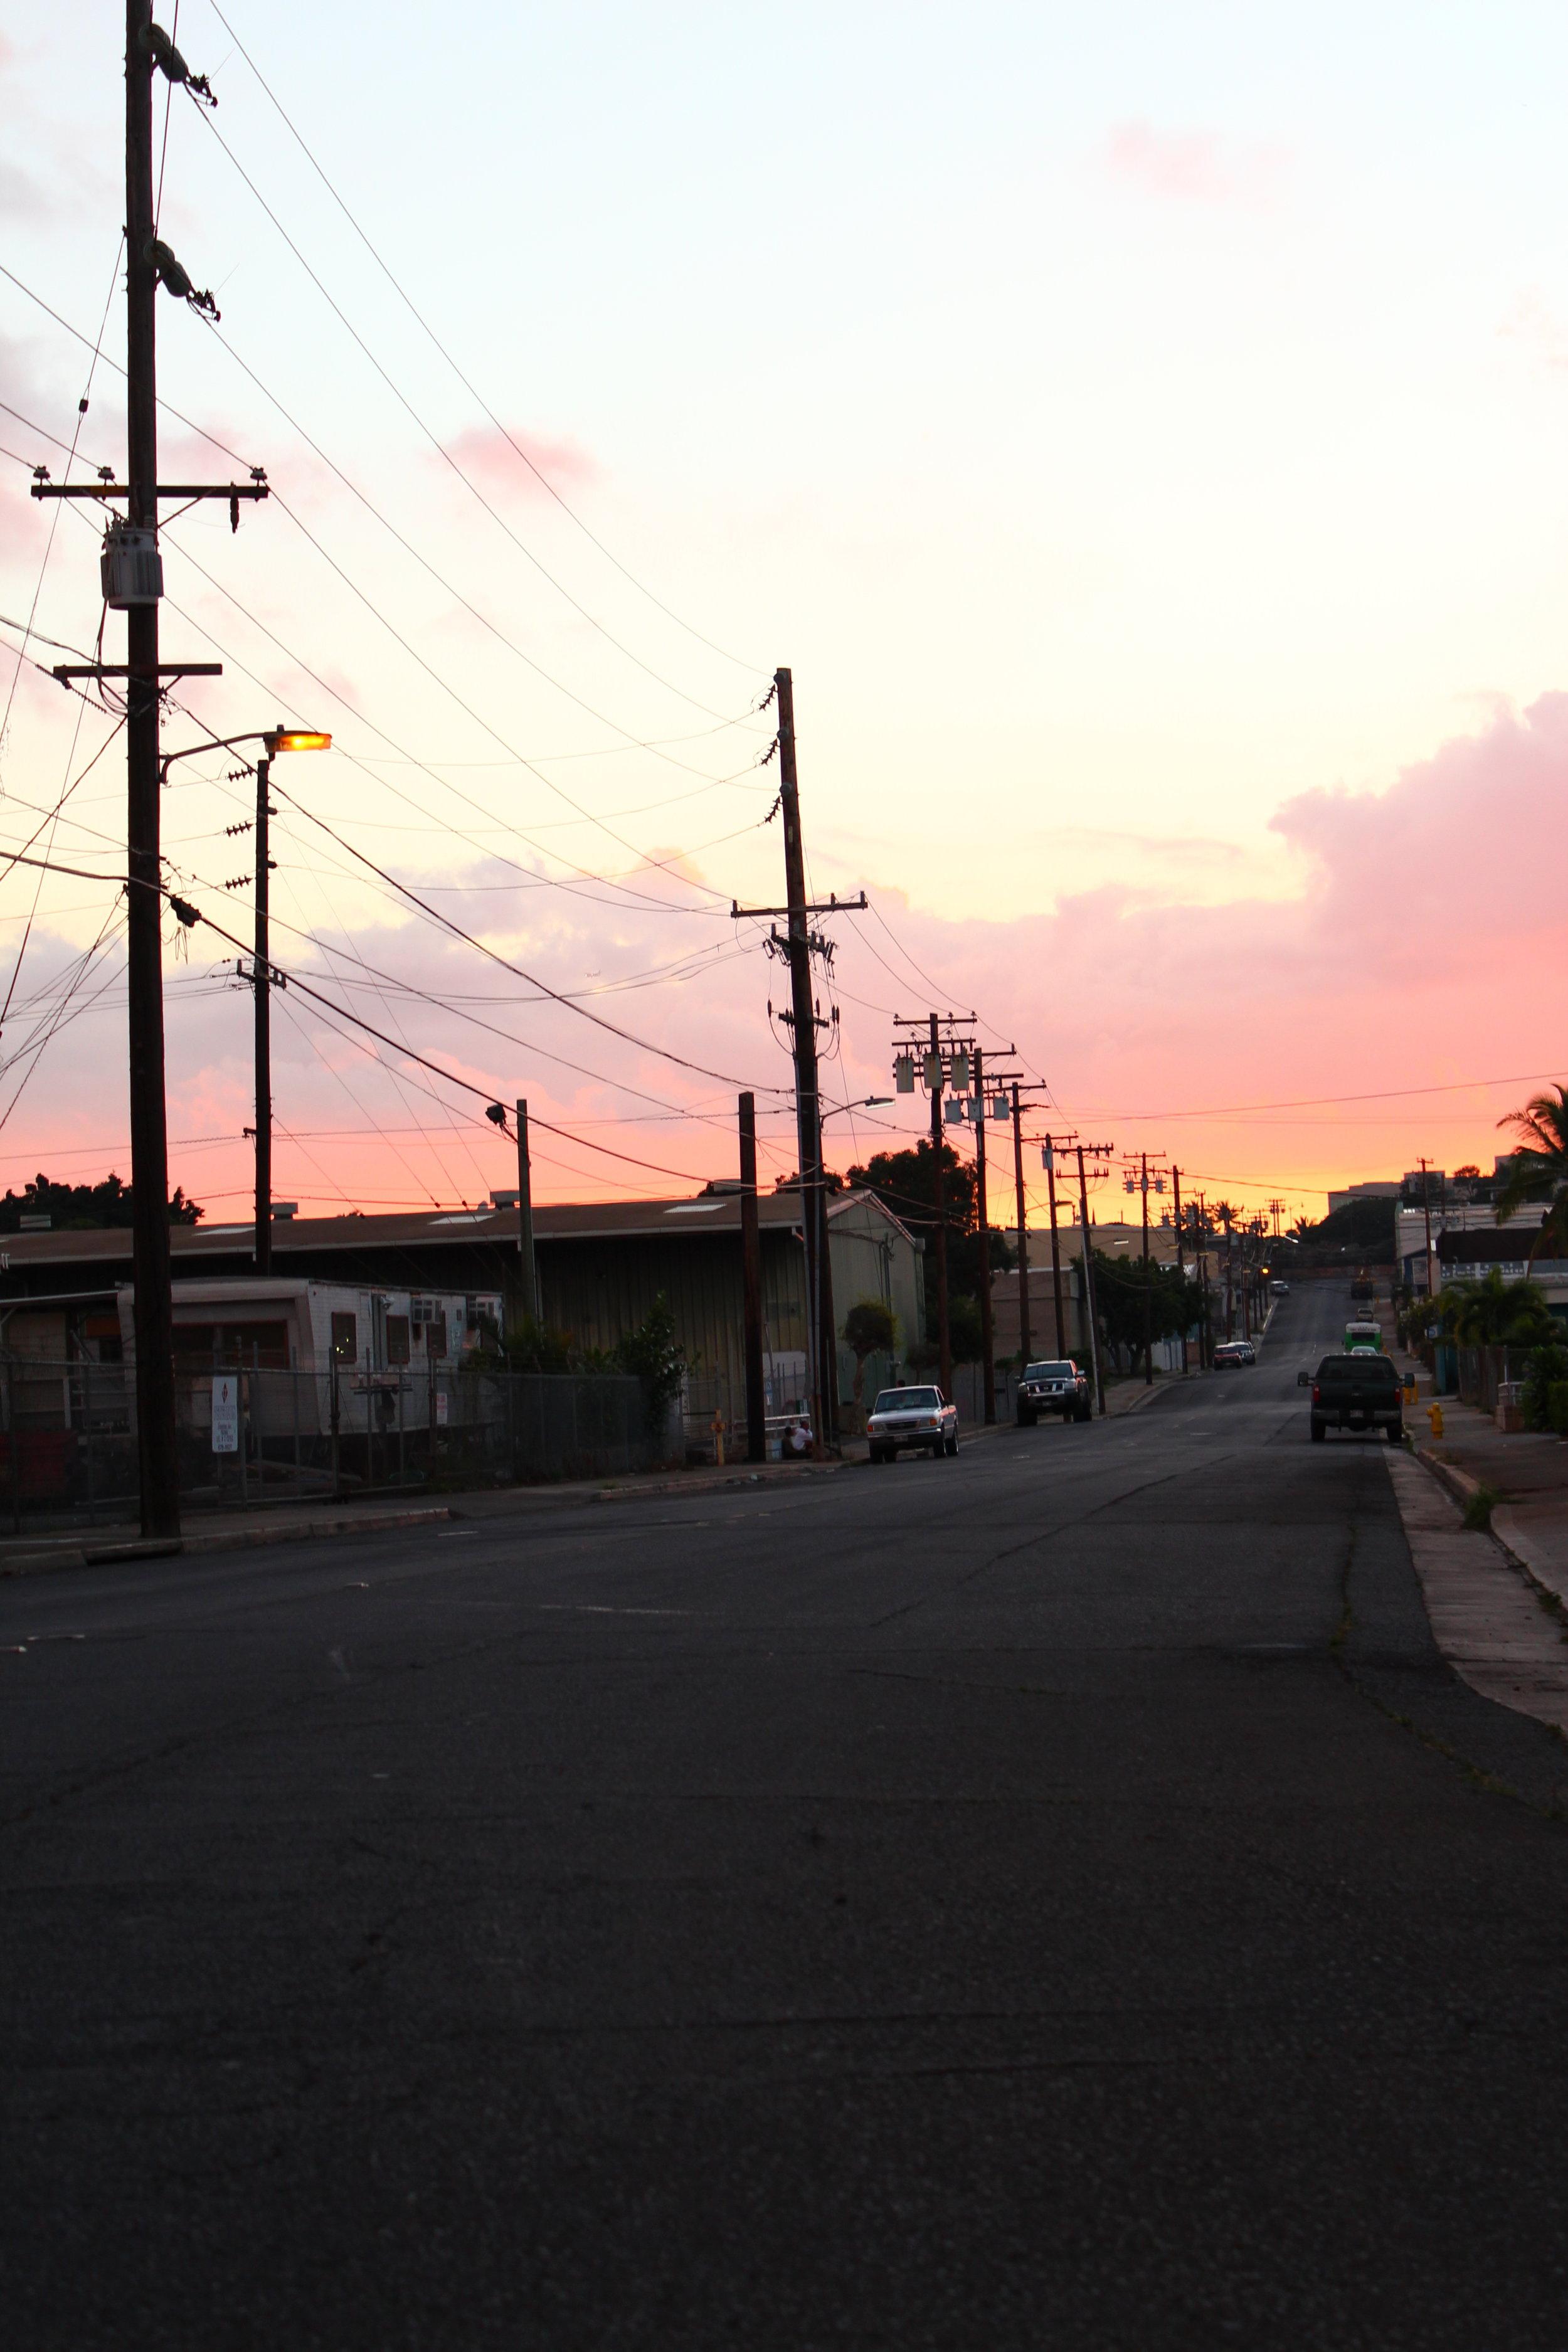 leokane sunset color IMG_5837 copy.JPG